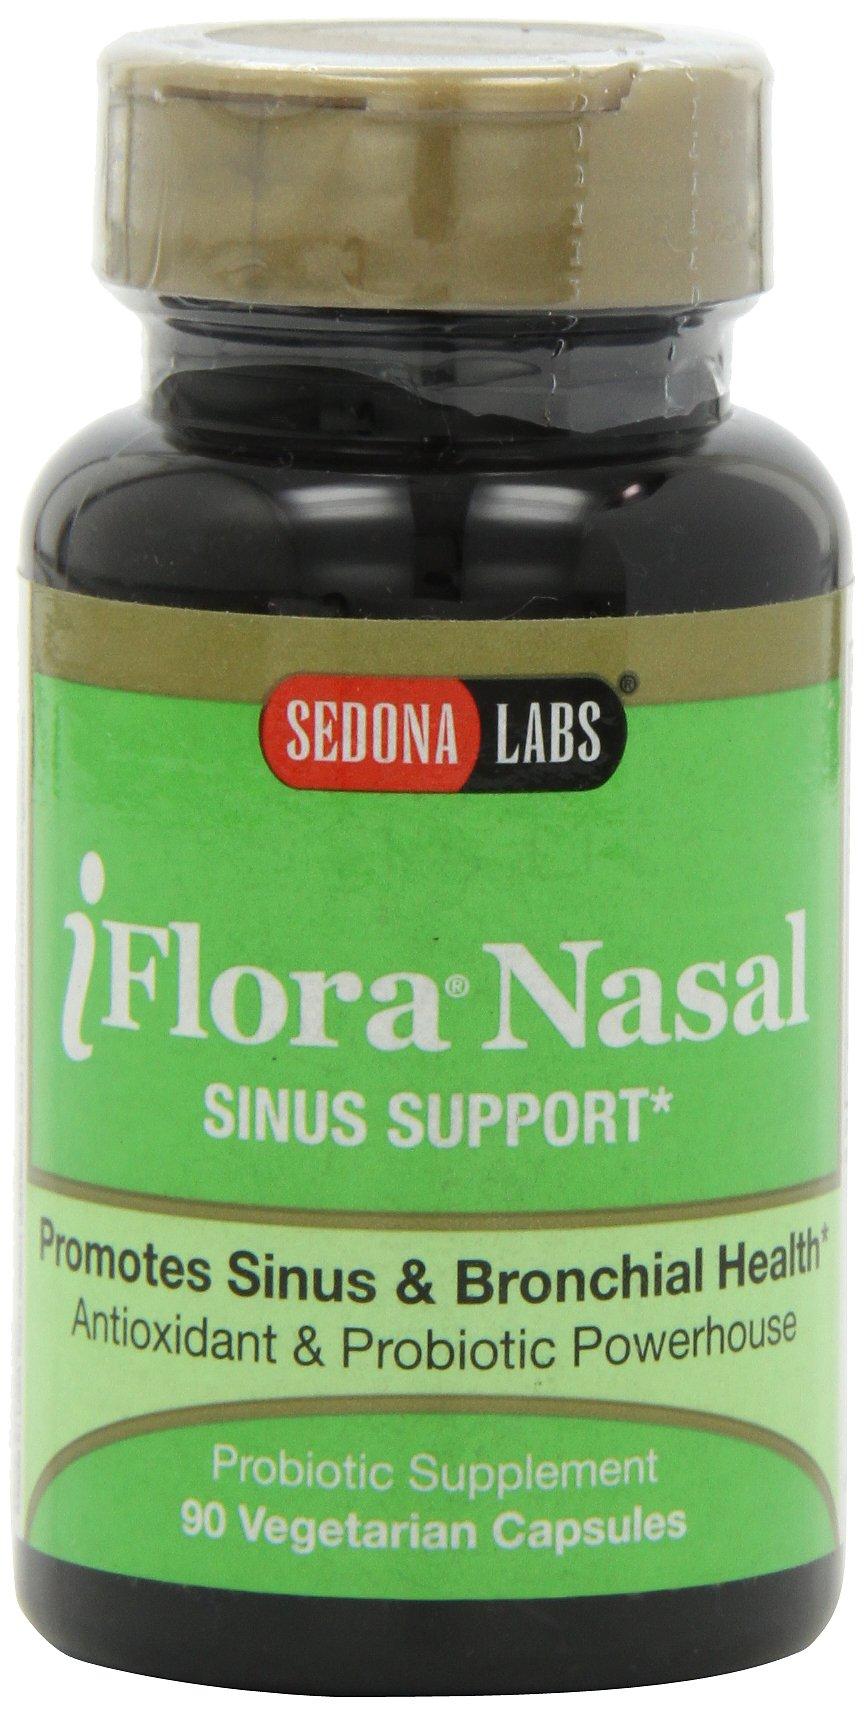 Sedona Labs Iflora Nasal Health Capsules, 90-Count